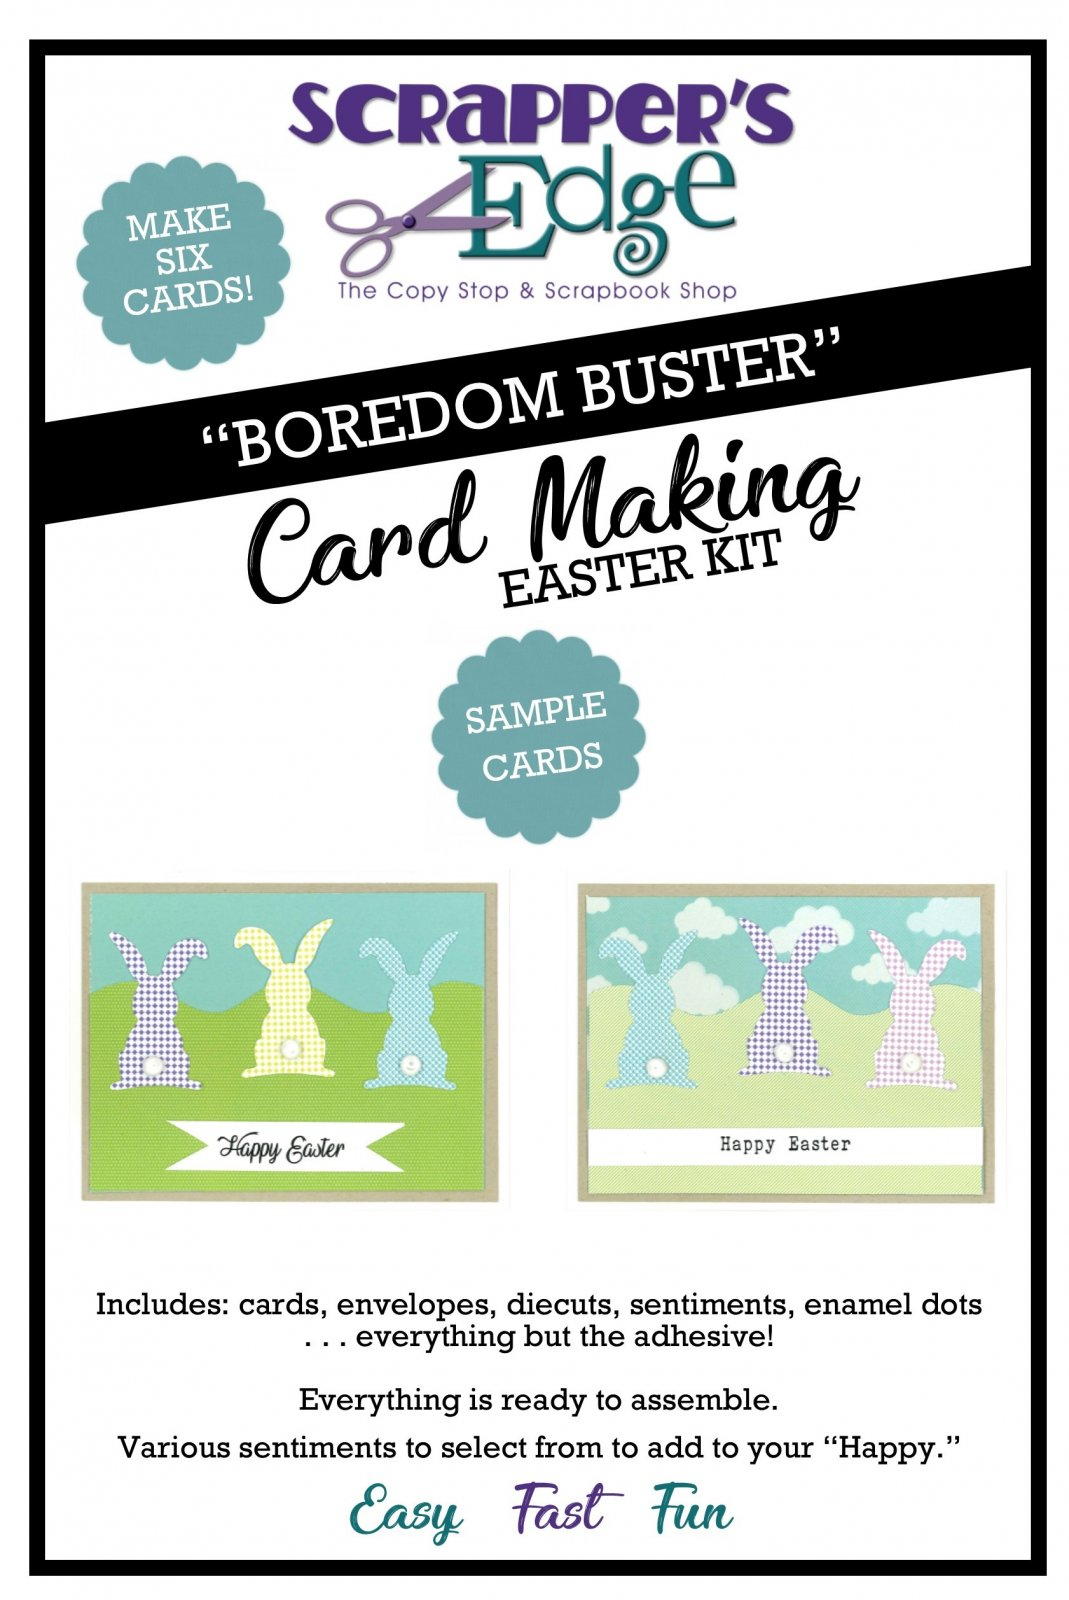 Boredom Buster Cardmaking Kit - Easter